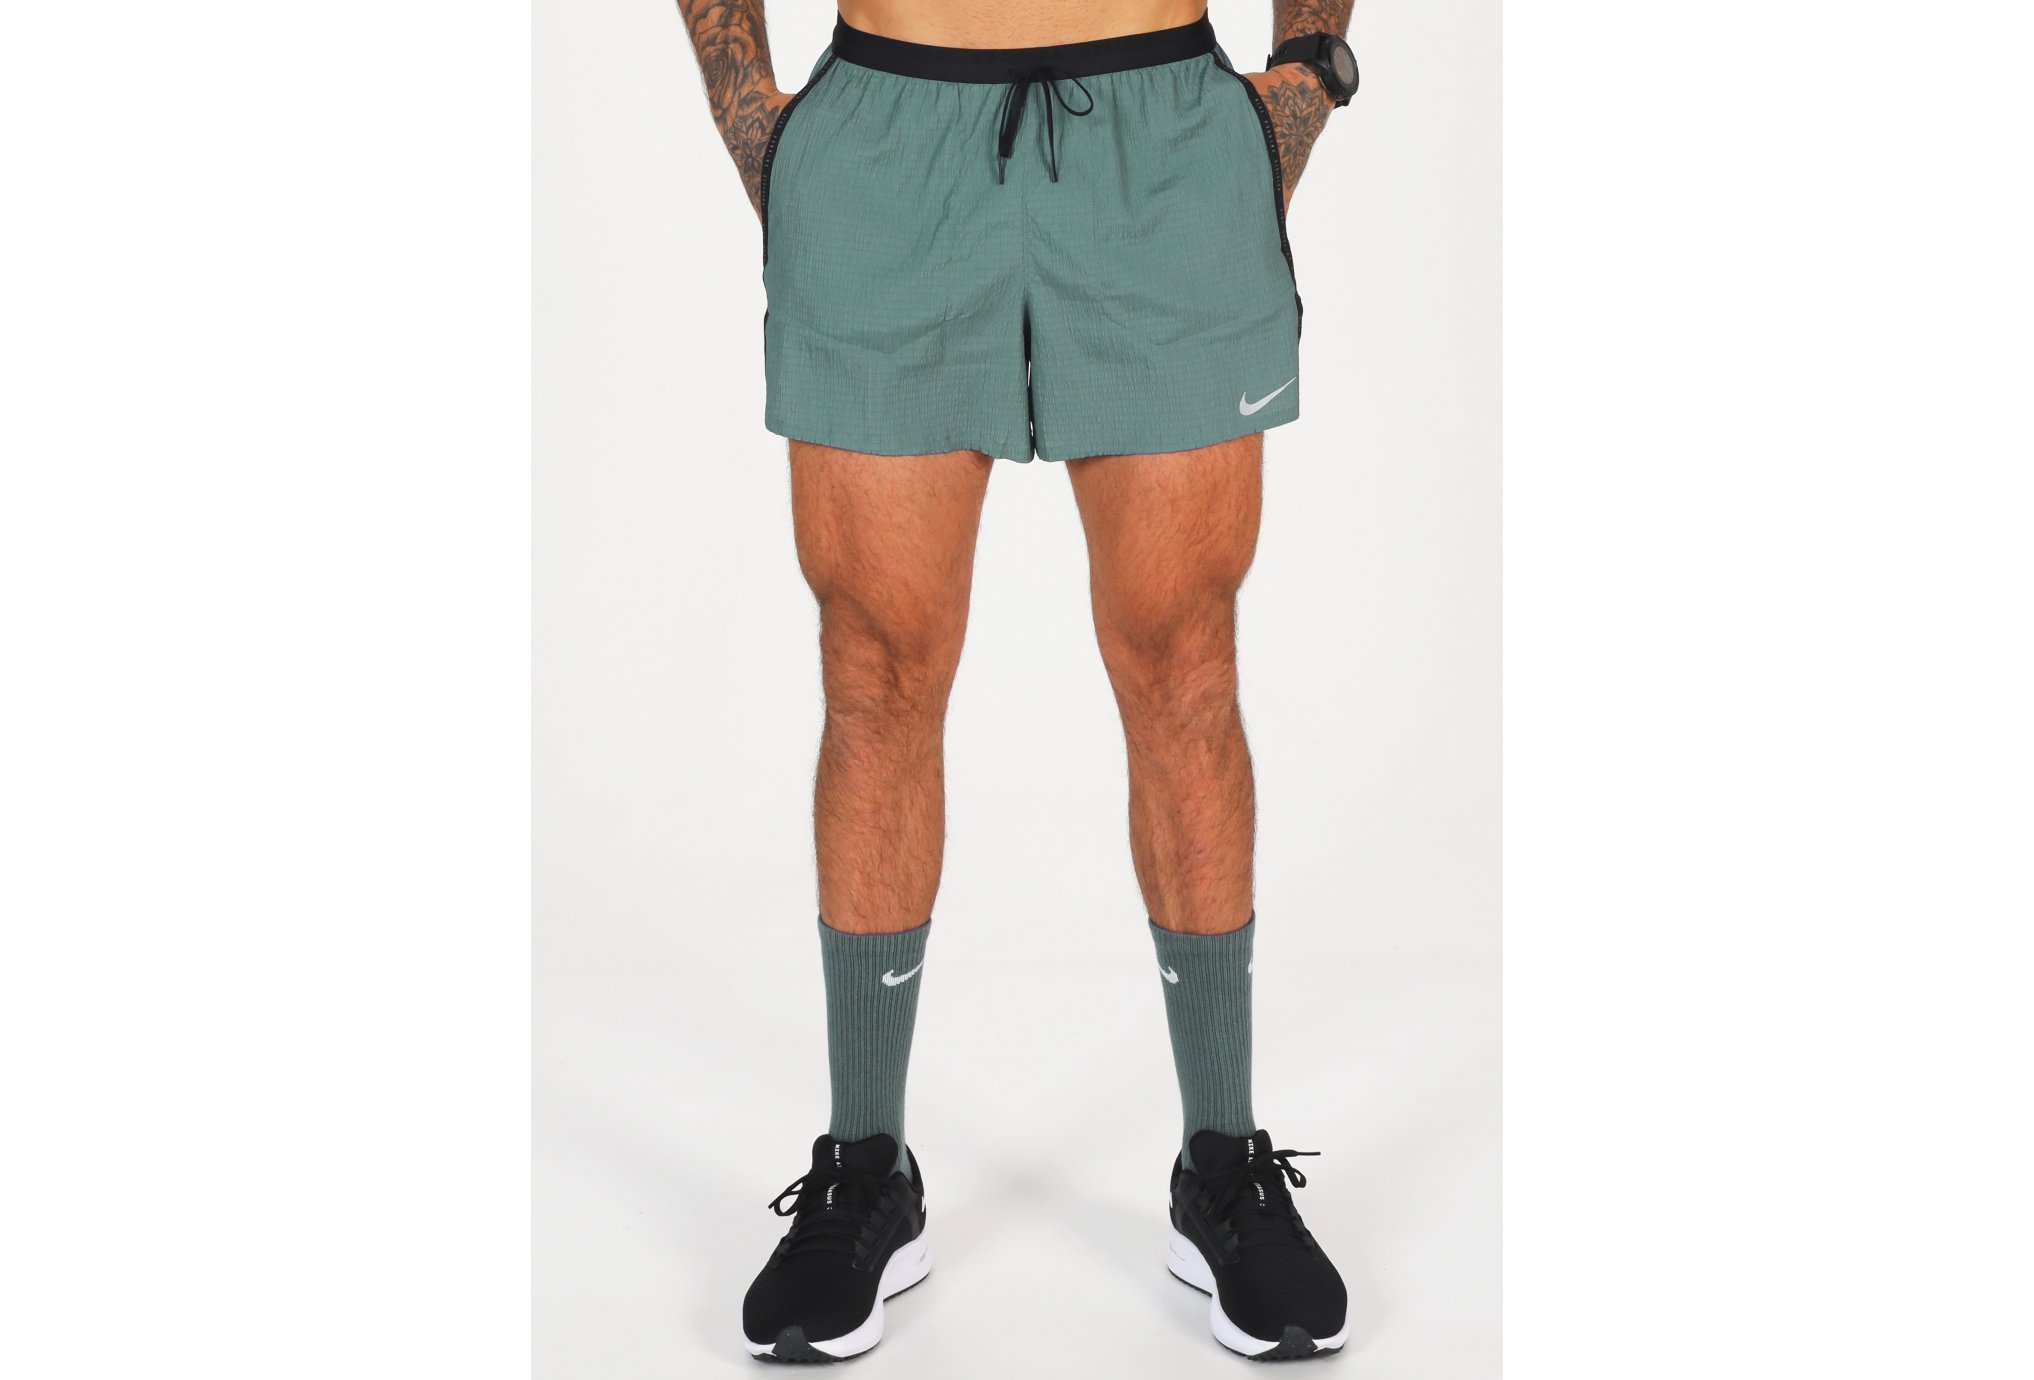 Nike Flex Stride Run Division 2 en 1 M vêtement running homme